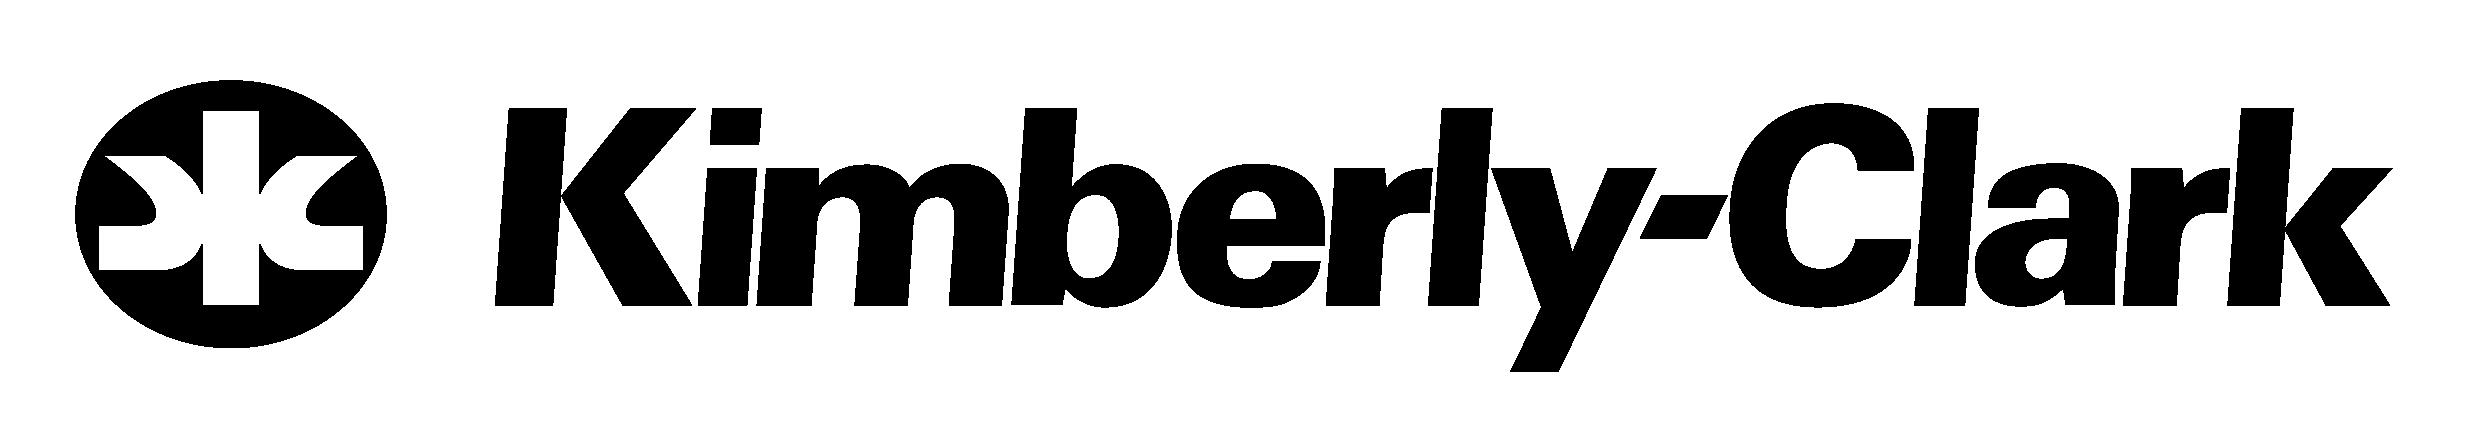 "Logotipo da empresa Kimberly-Clark. O nome ""Kimberly-Clark"" está escrito na cor preta. Do lado esquerdo, há uma forma abstrata."